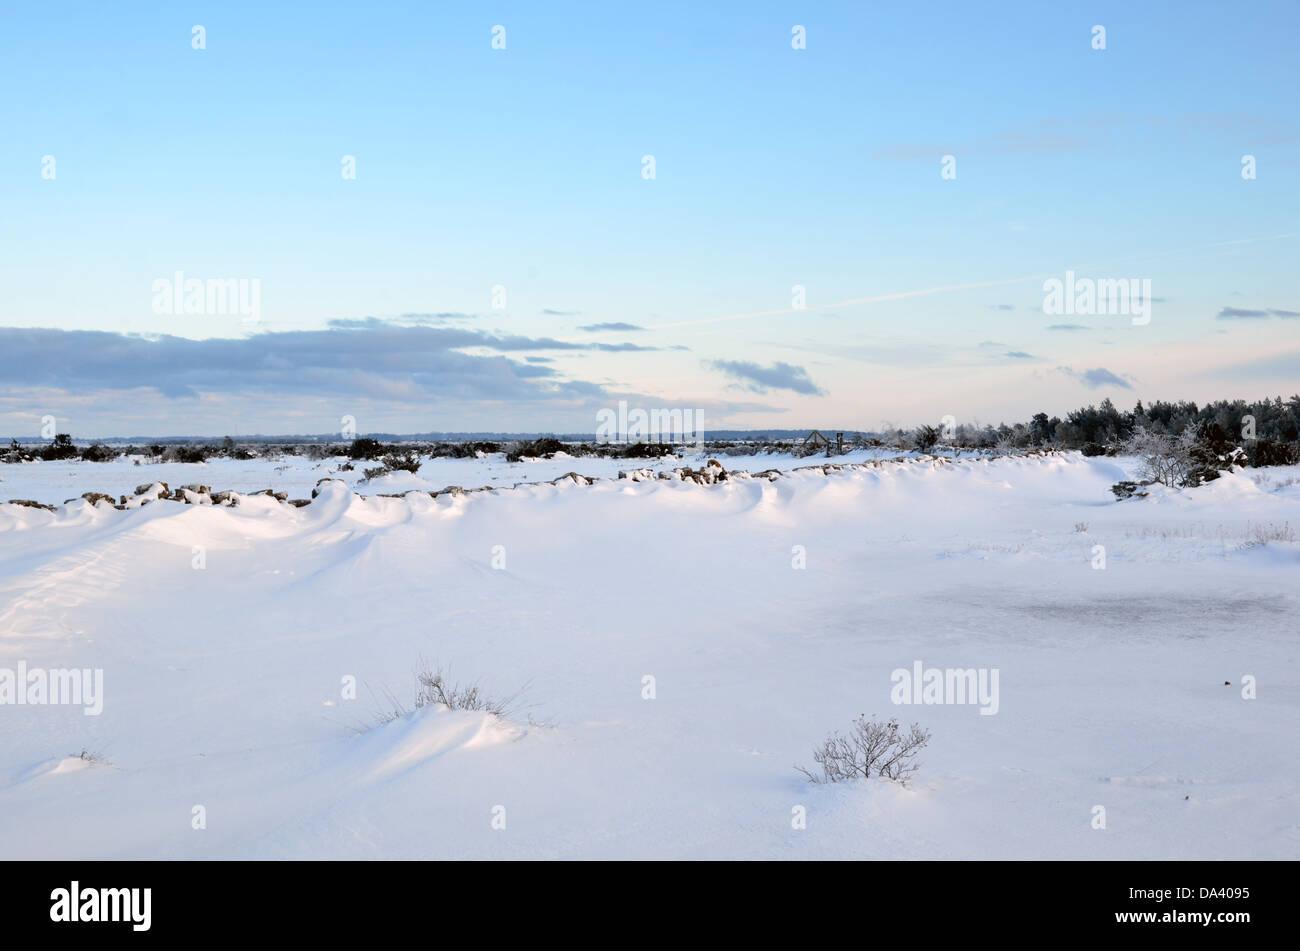 Snowdrift at stonewall - Stock Image